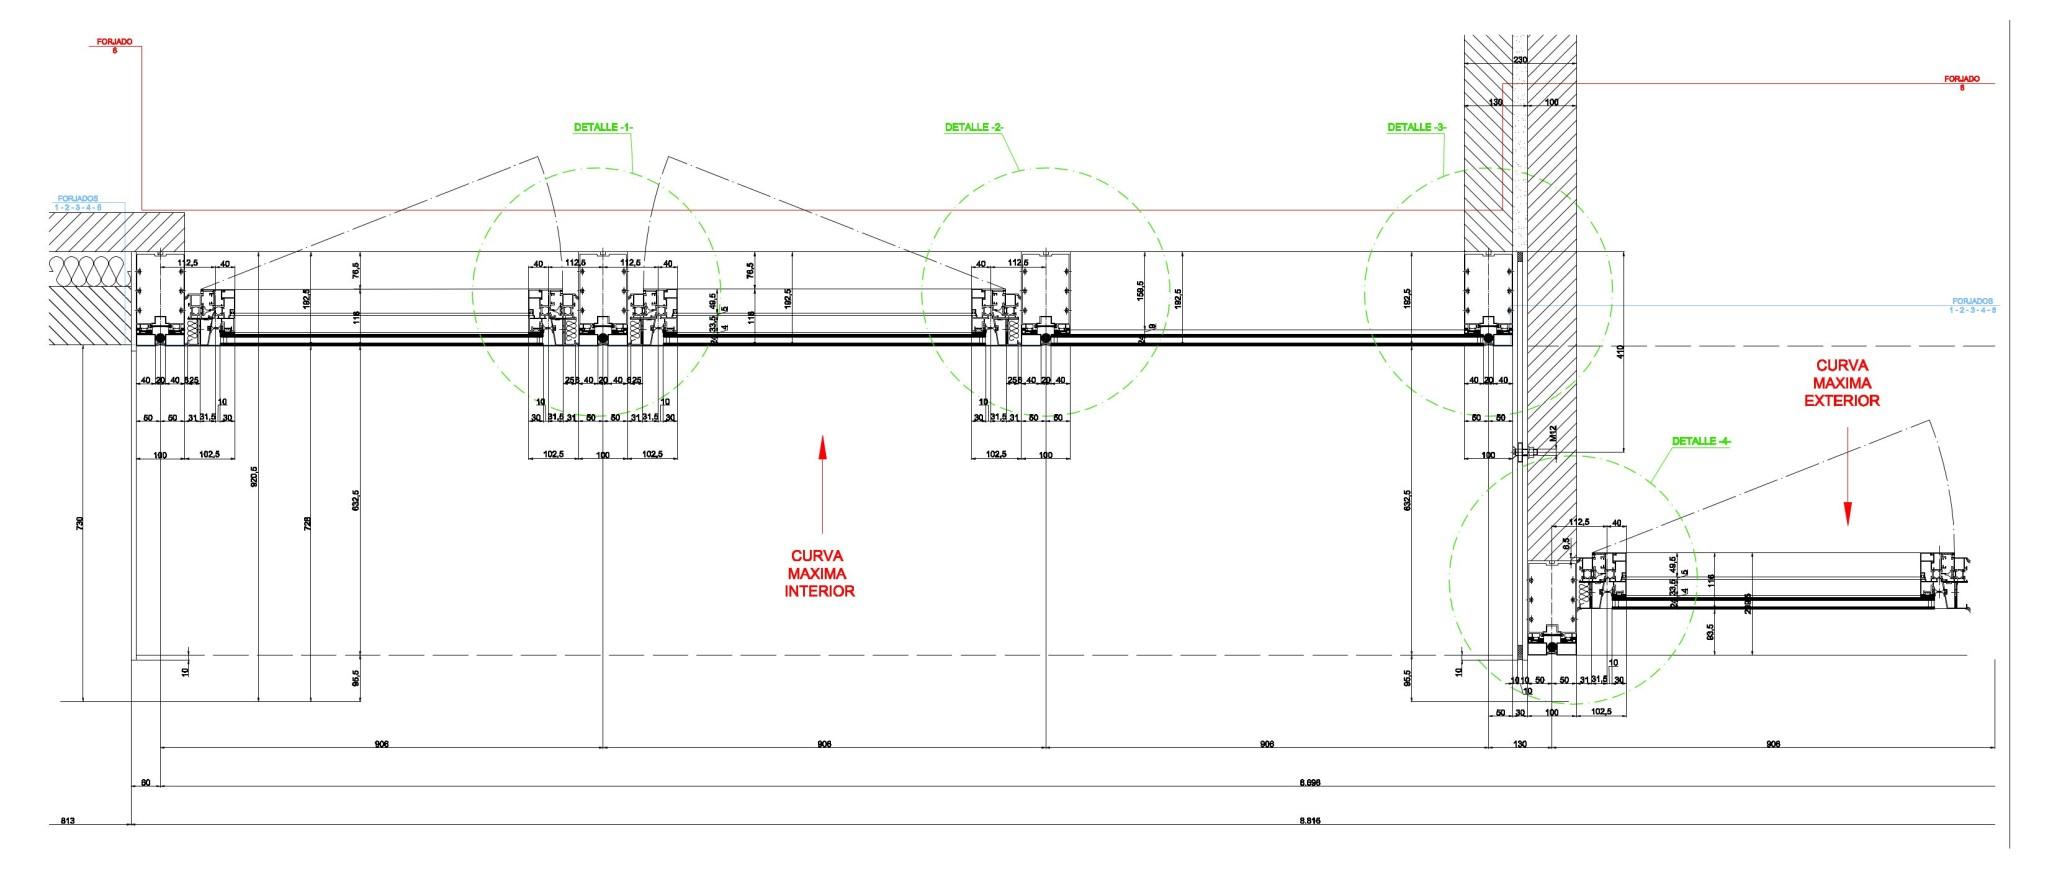 viviendas-hurtado-amezaga-bilbao-fachada-modular-muro-cortina-planta-detalle_